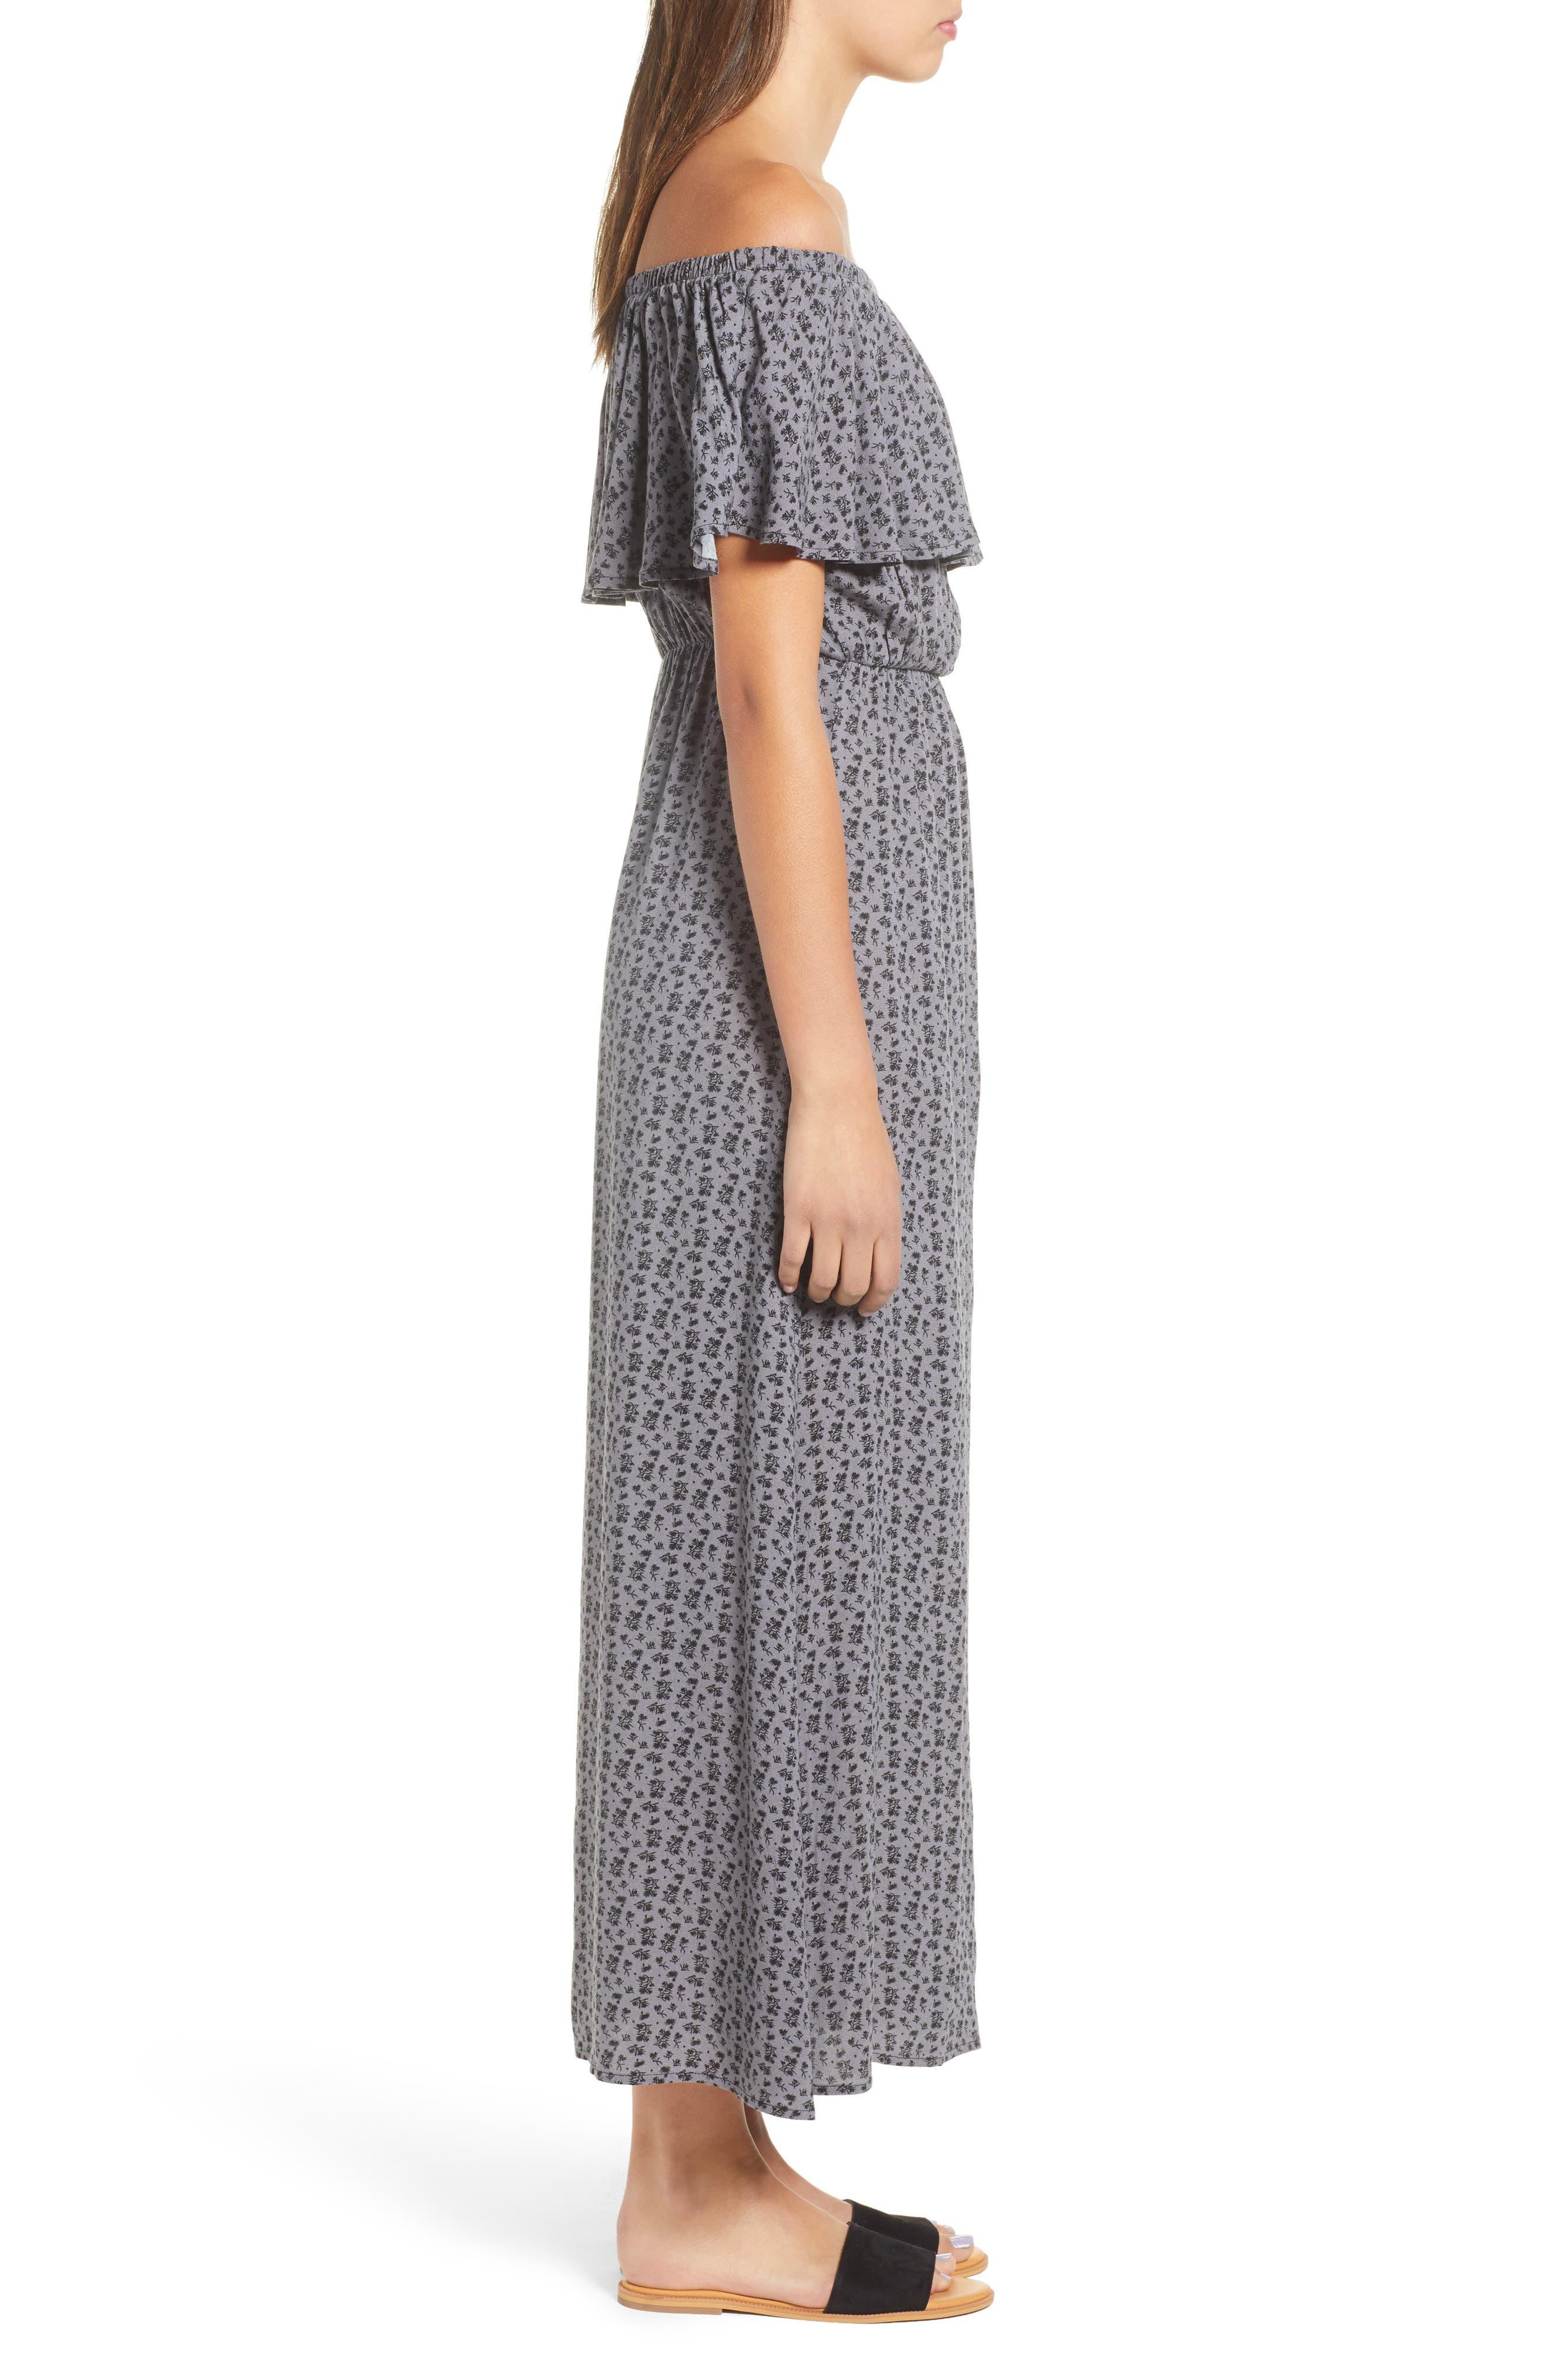 LIRA CLOTHING,                             Marissa Floral Print Off the Shoulder Dress,                             Alternate thumbnail 4, color,                             250